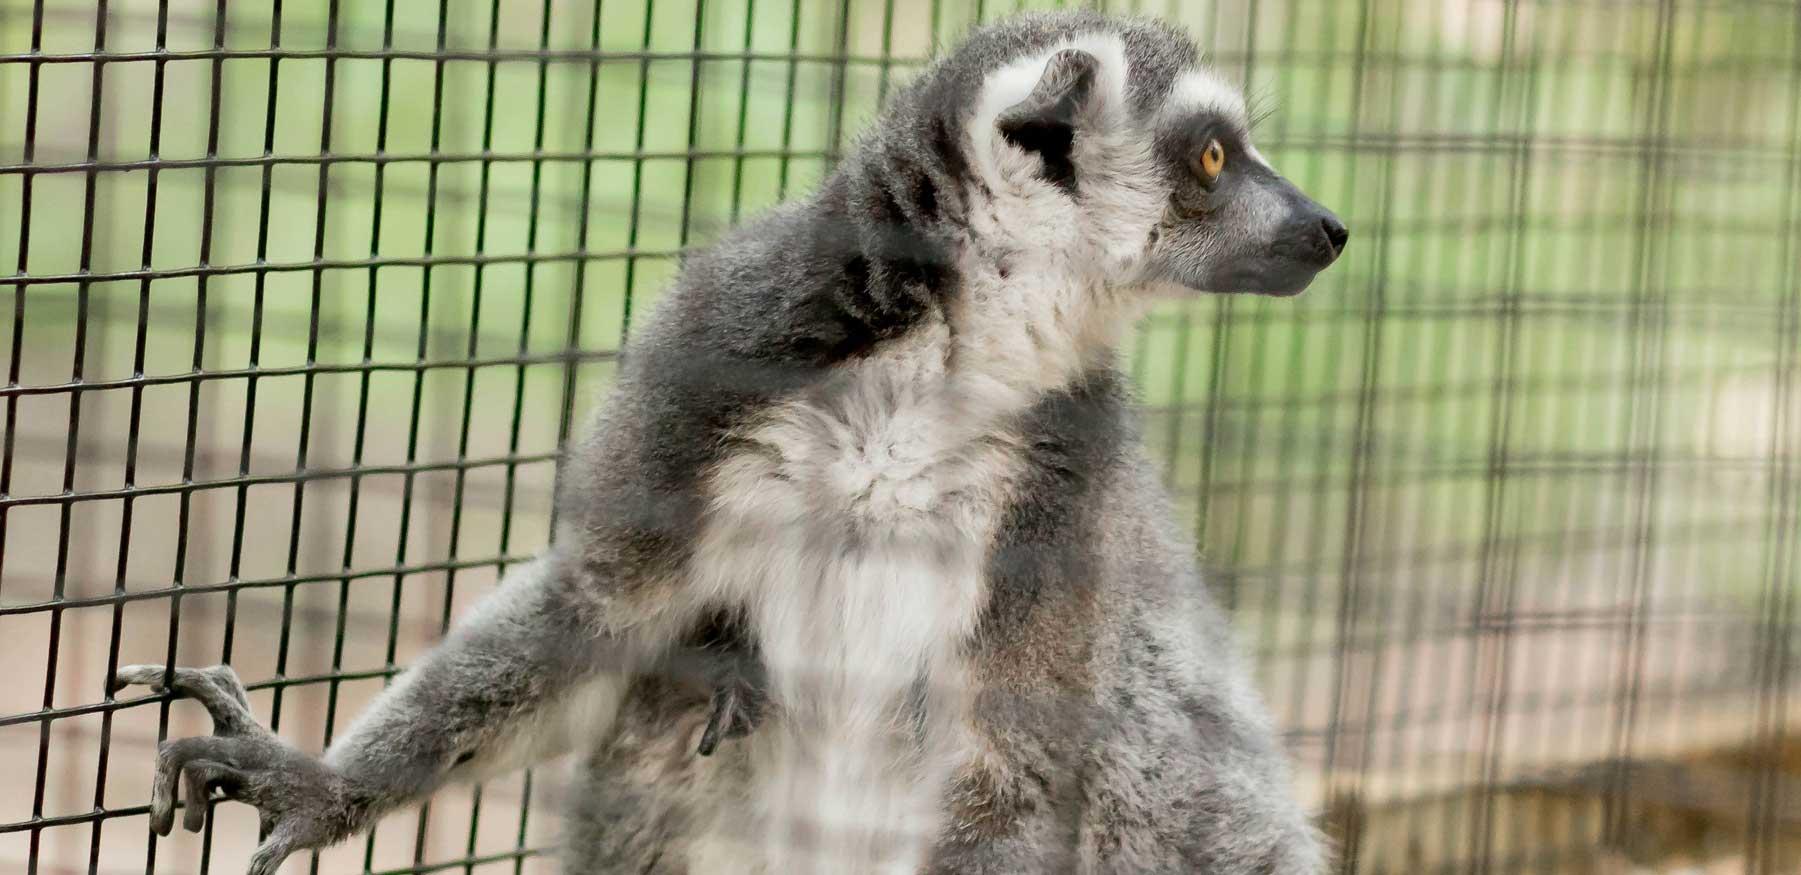 Ring-tailed lemur profile at YRWS